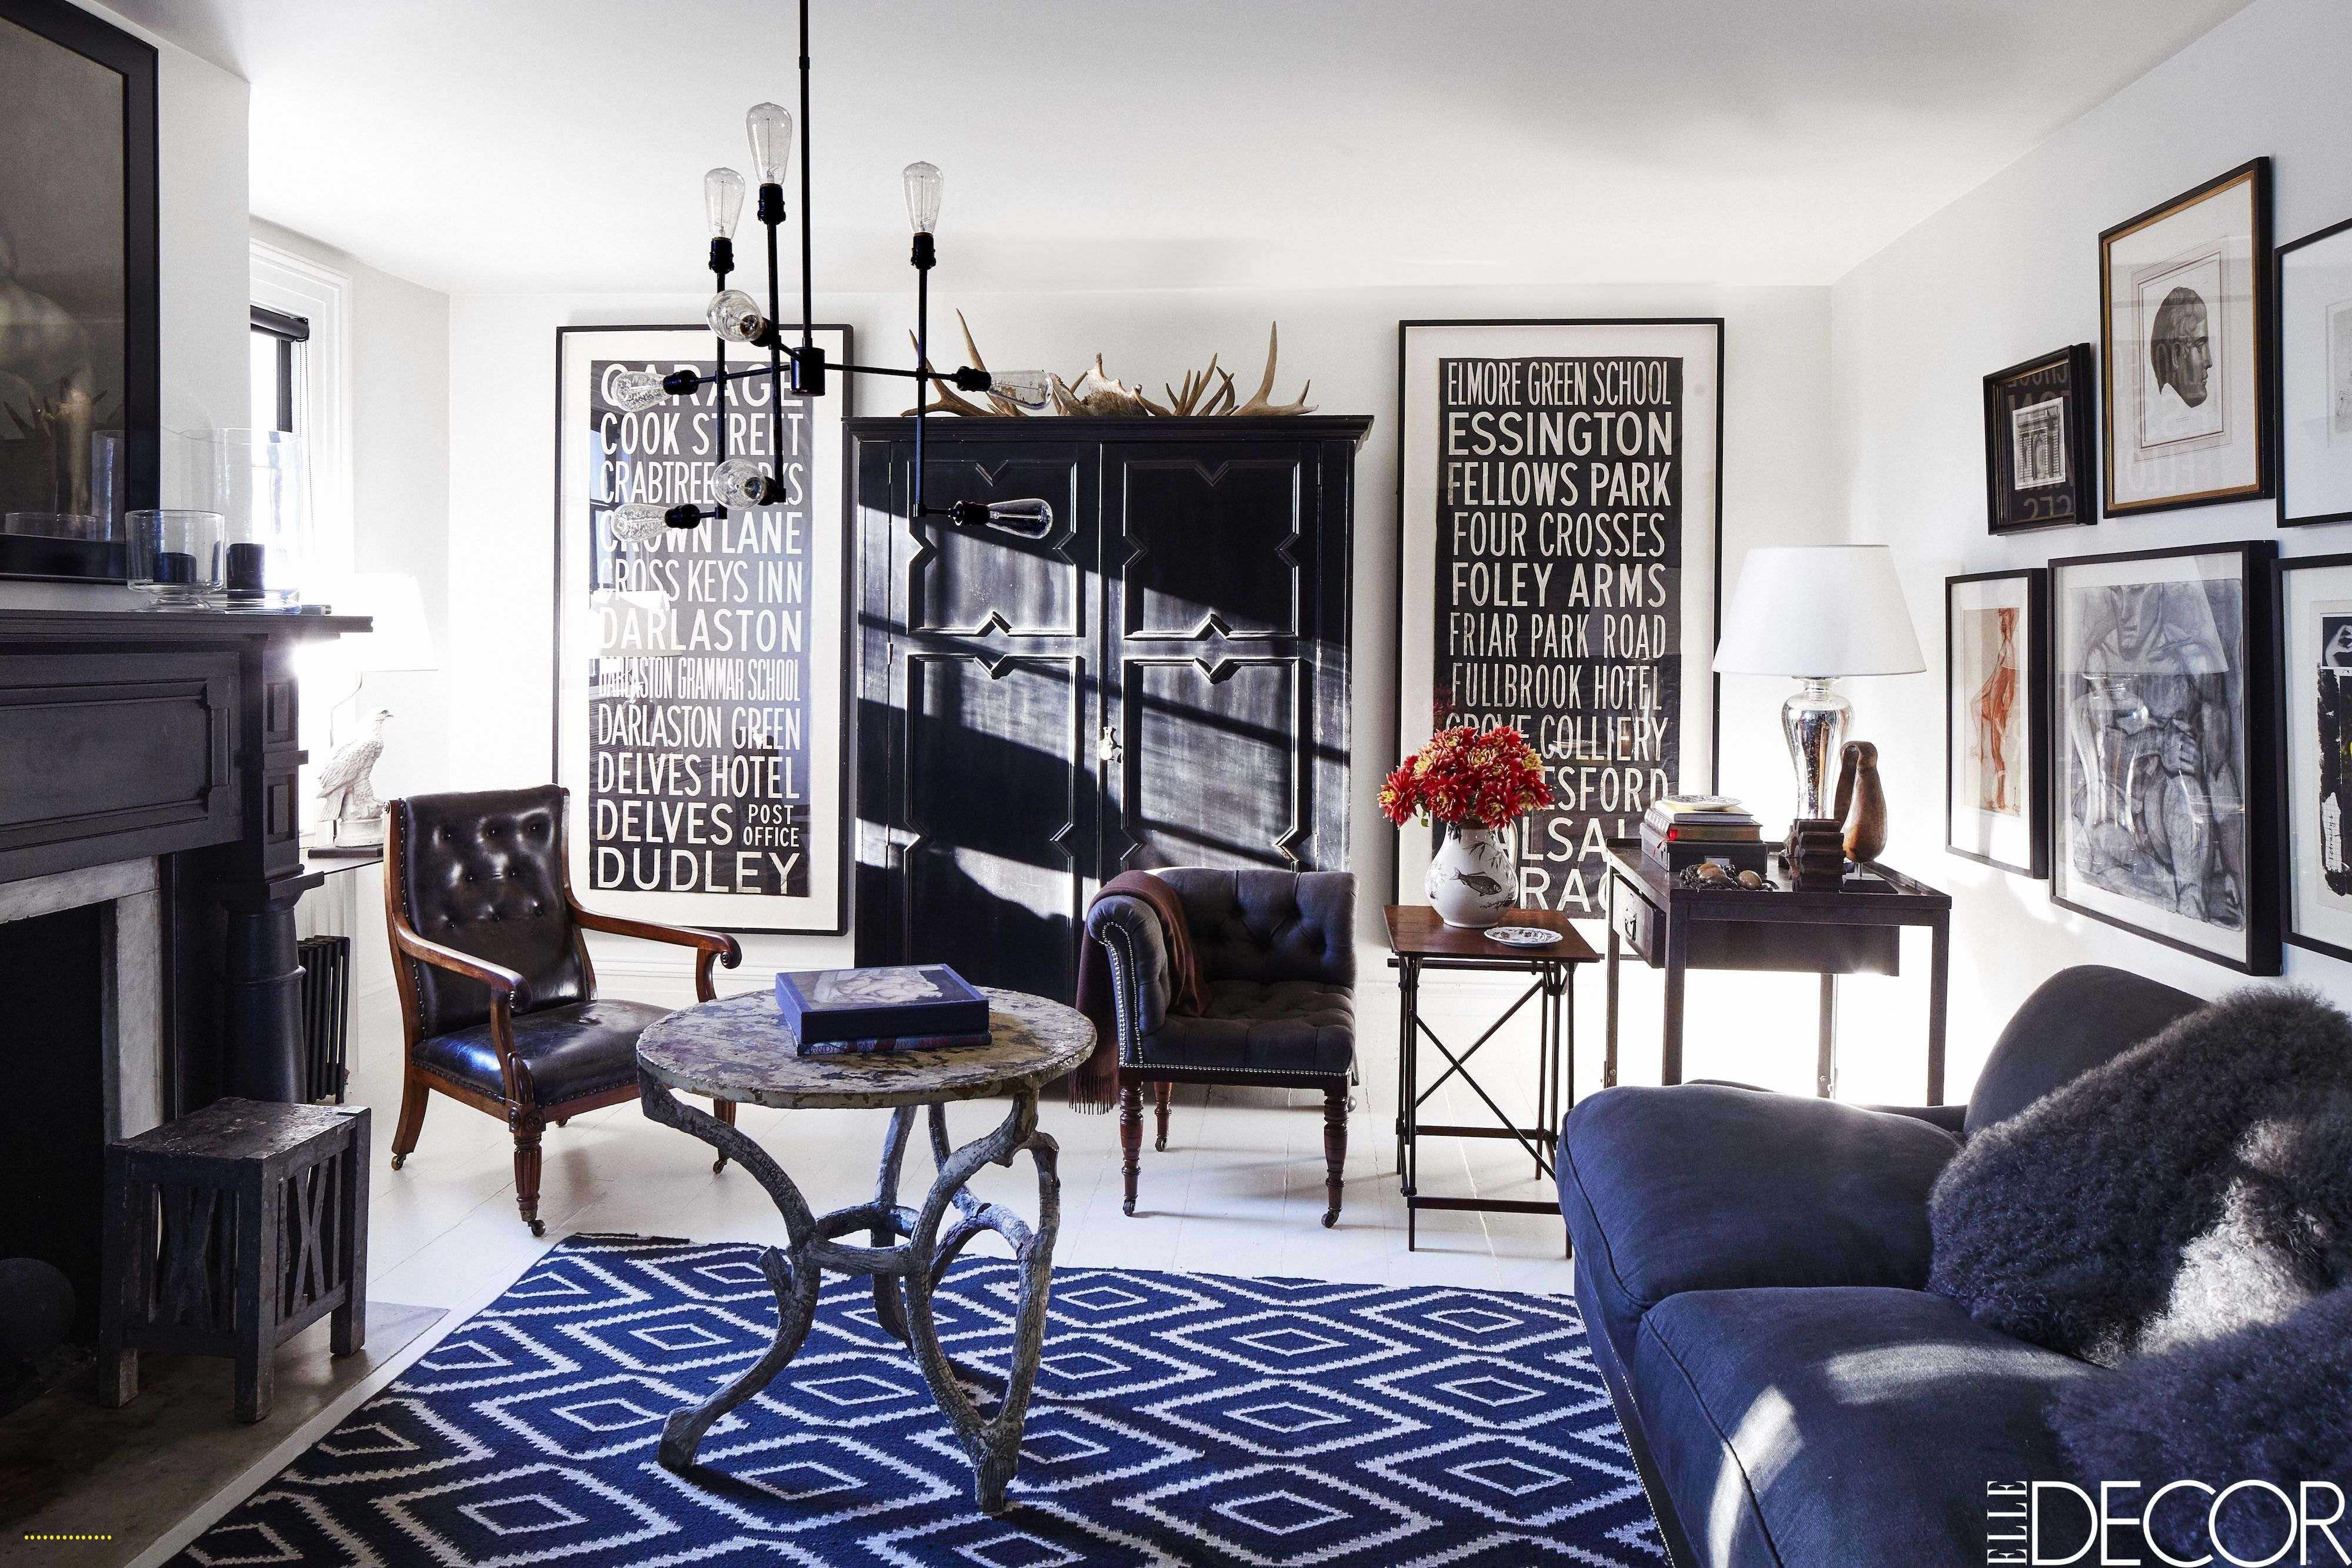 Fireplace Decorating Ideas Photos Luxury Living Room Tv Ideas Awesome 44 Awesome Home Decor Ideas